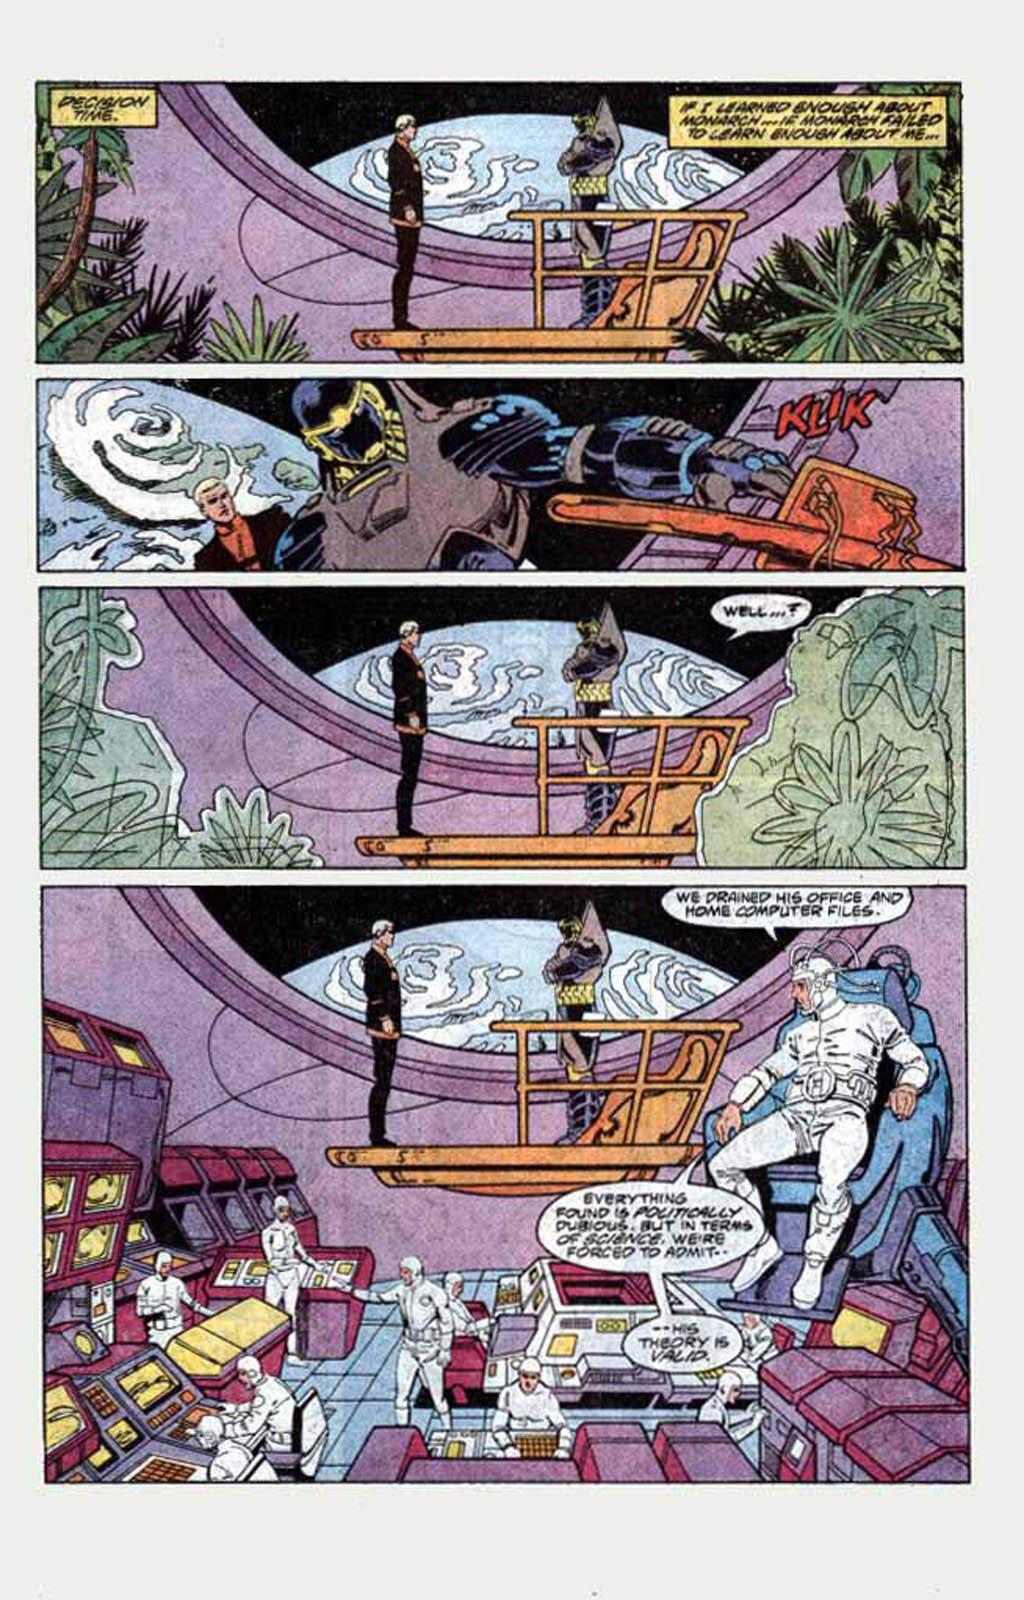 Read online Armageddon 2001 comic -  Issue #1 - 43